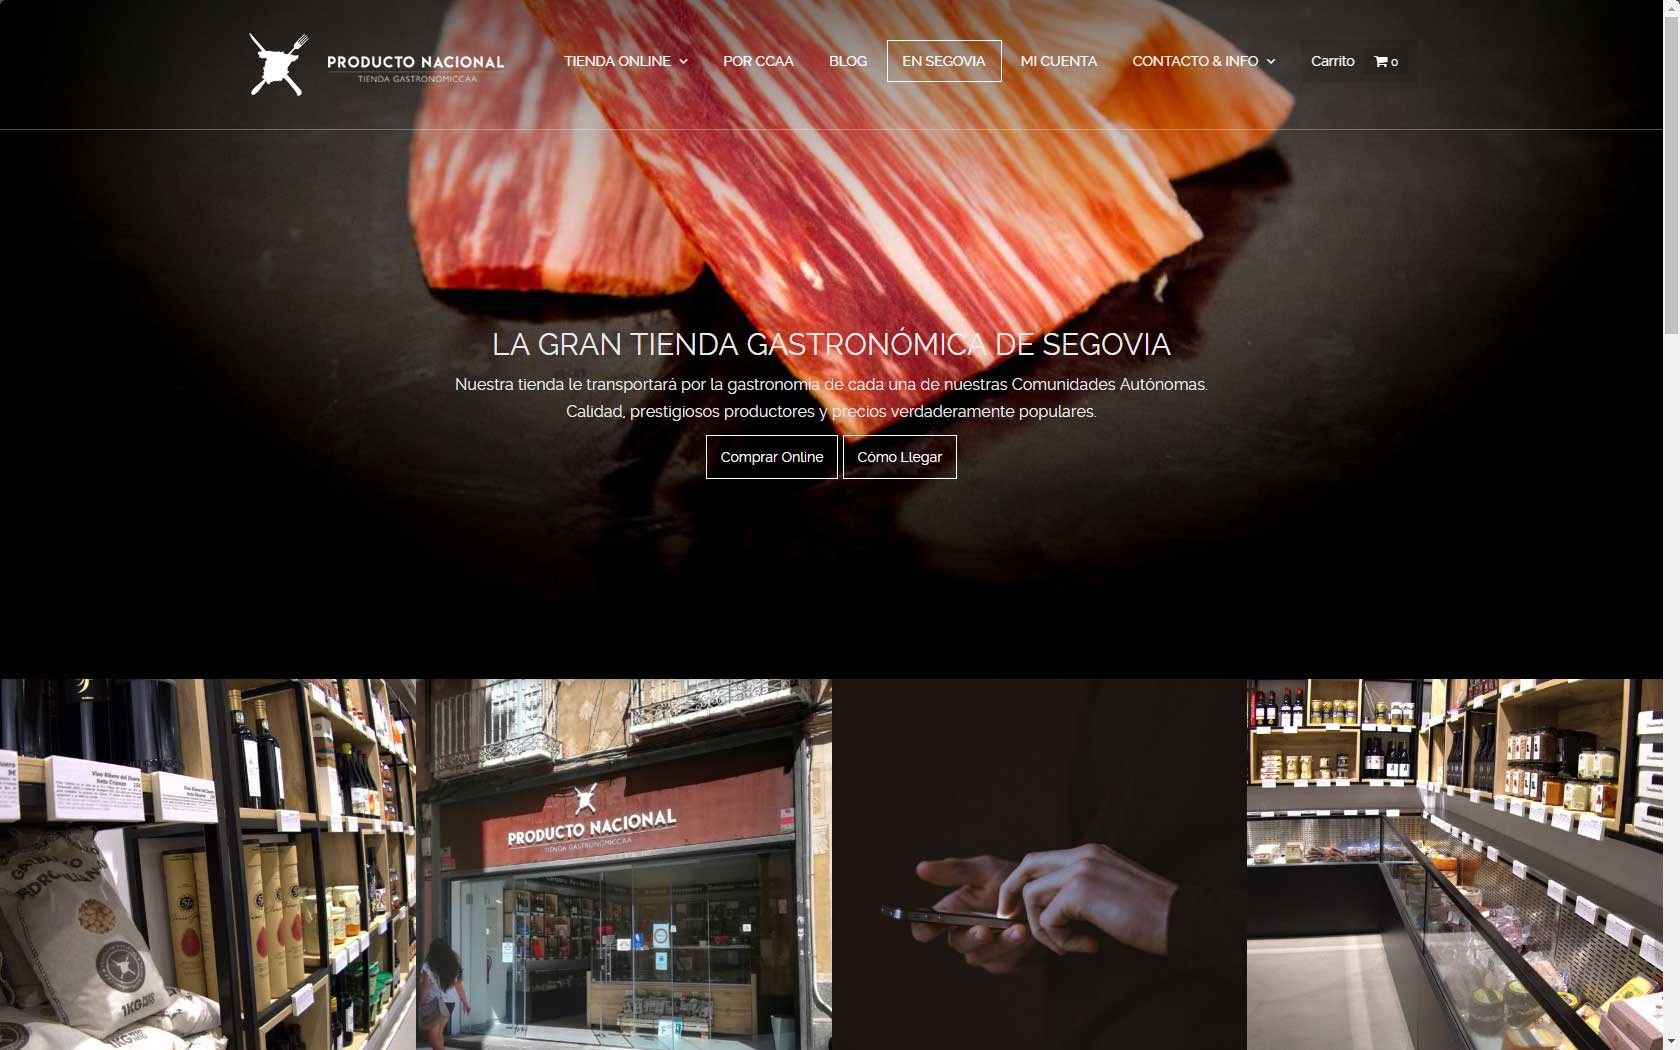 eshop-blog-seo-productonacional-webdesign-segovia-5